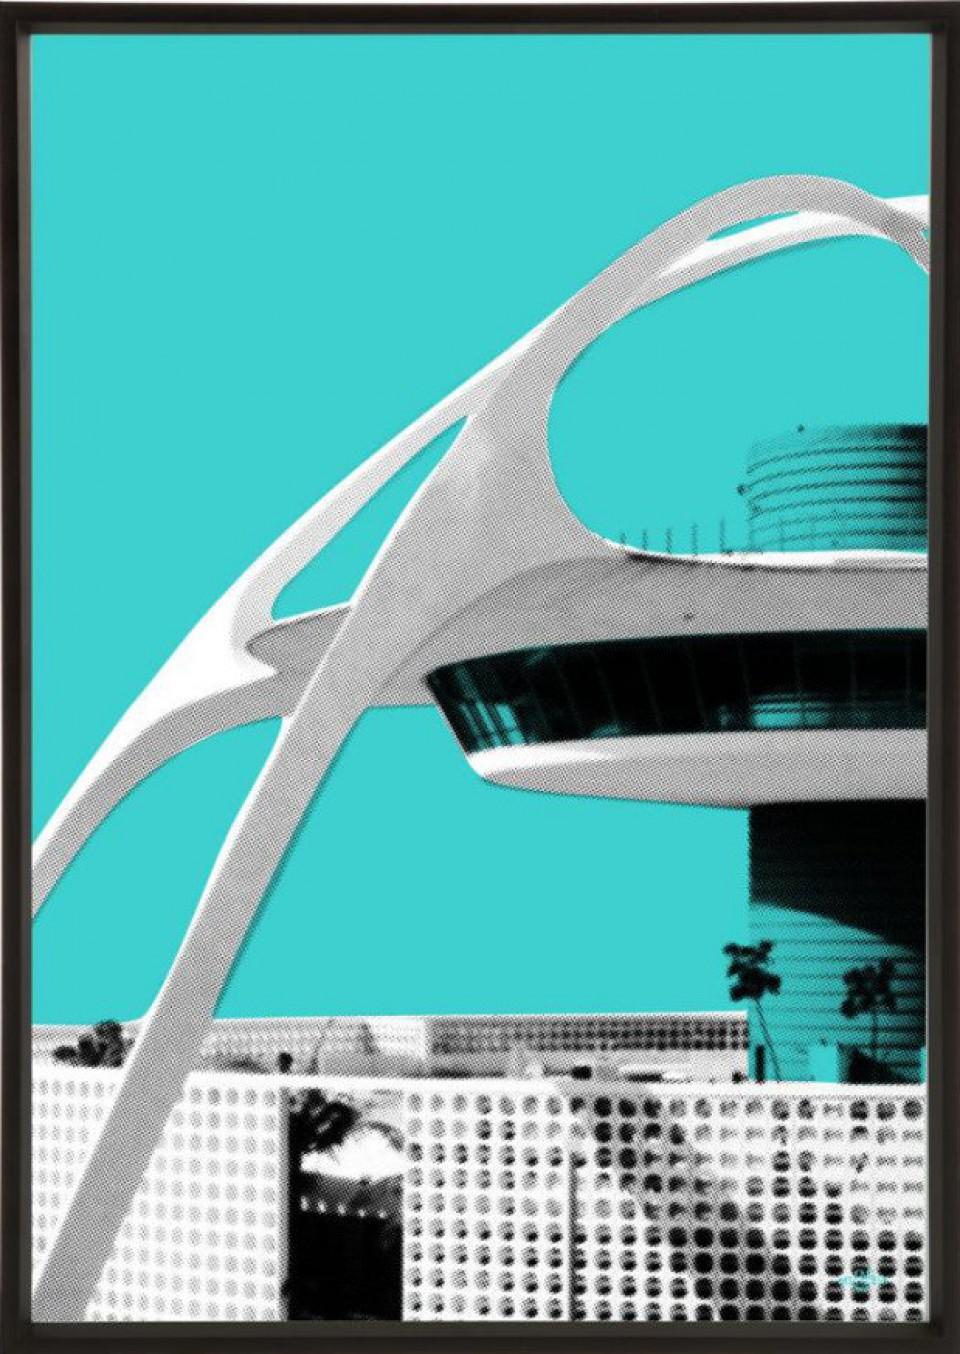 theme-building-at-lax-pop-art-print-2_2_1.jpg